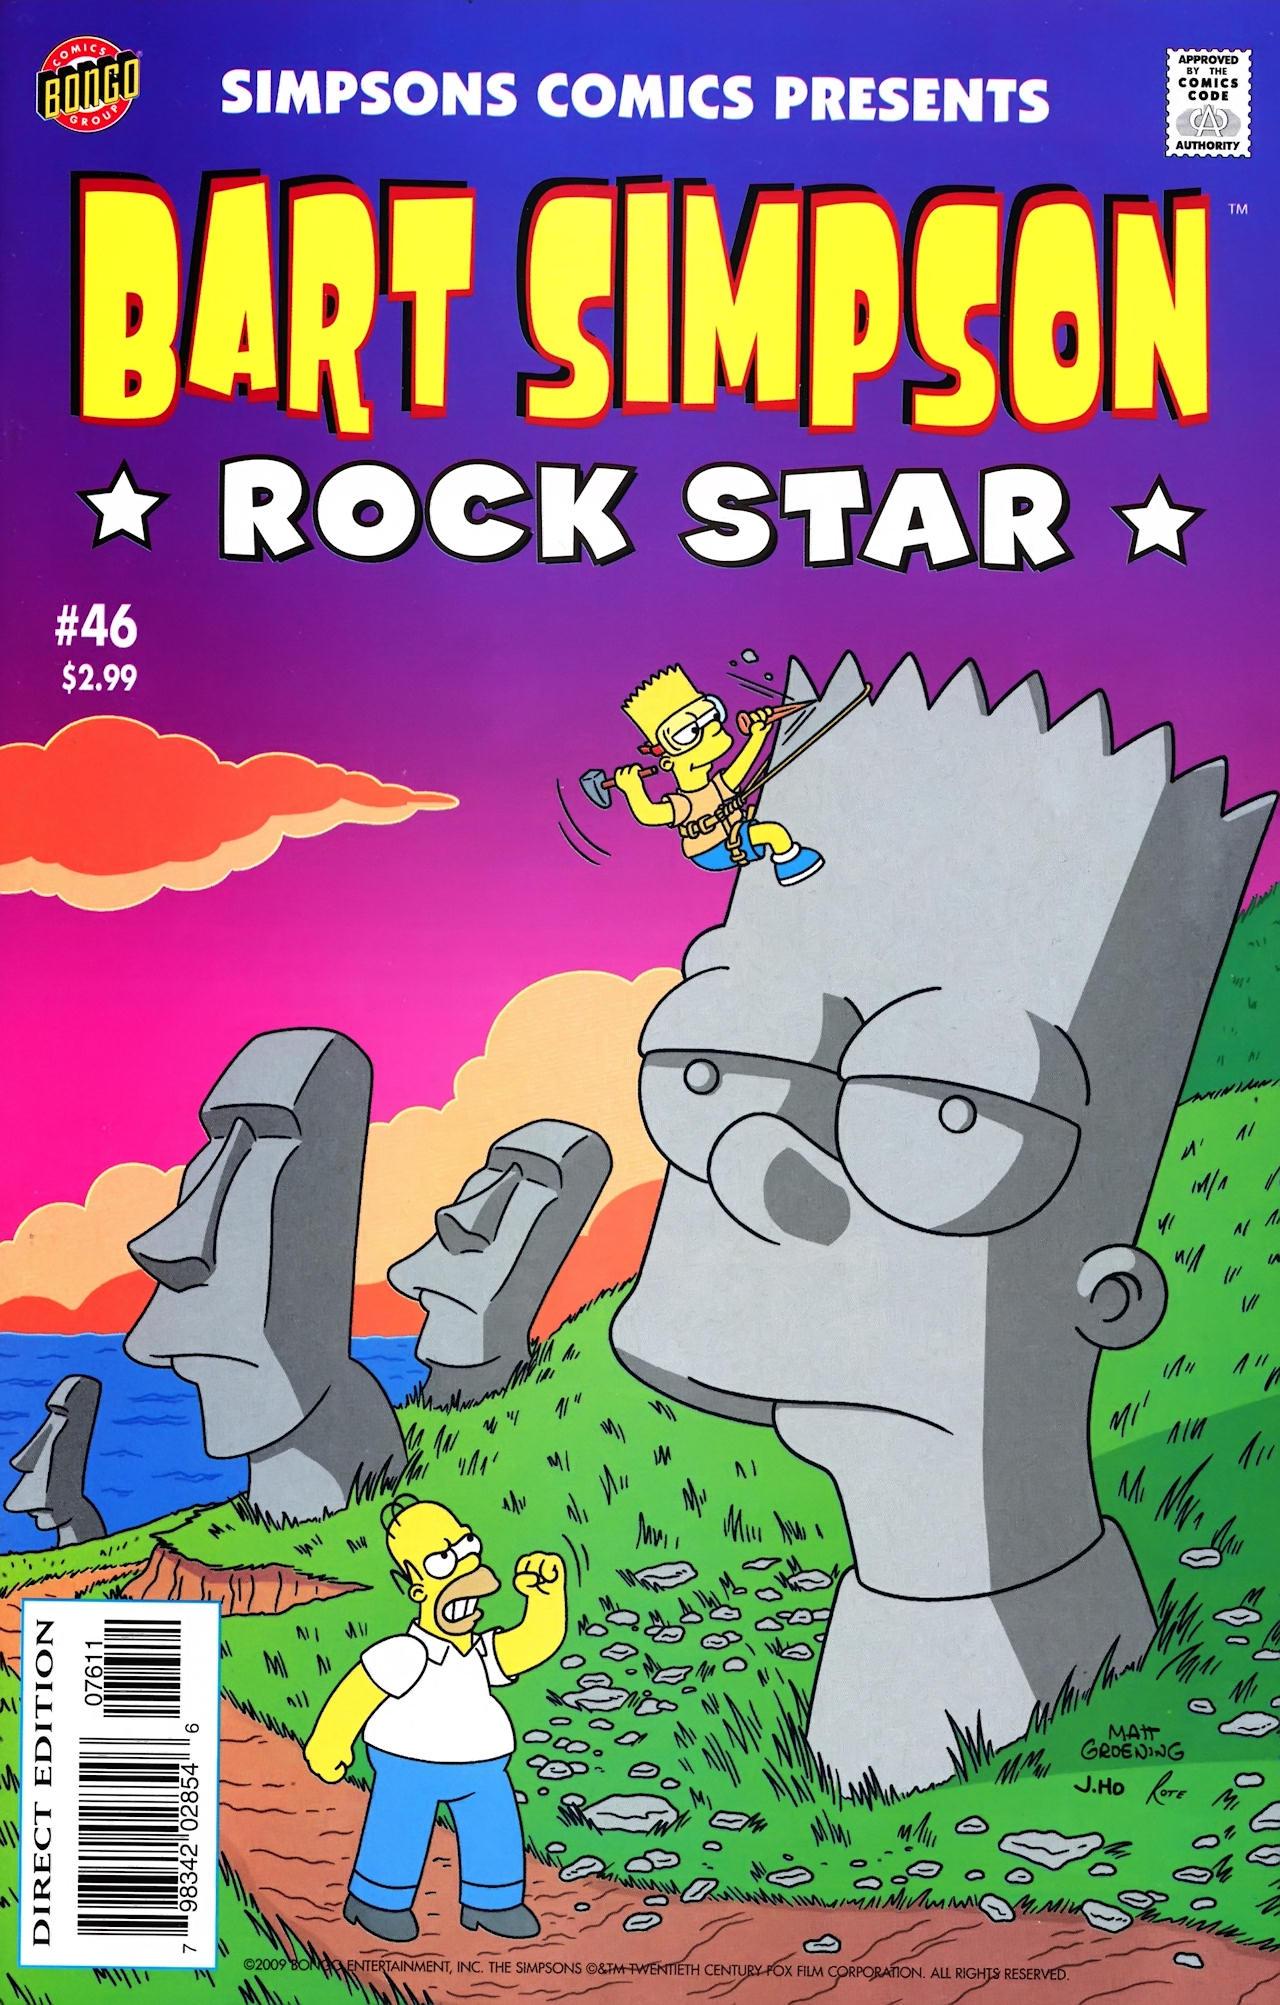 Read online Simpsons Comics Presents Bart Simpson comic -  Issue #46 - 1